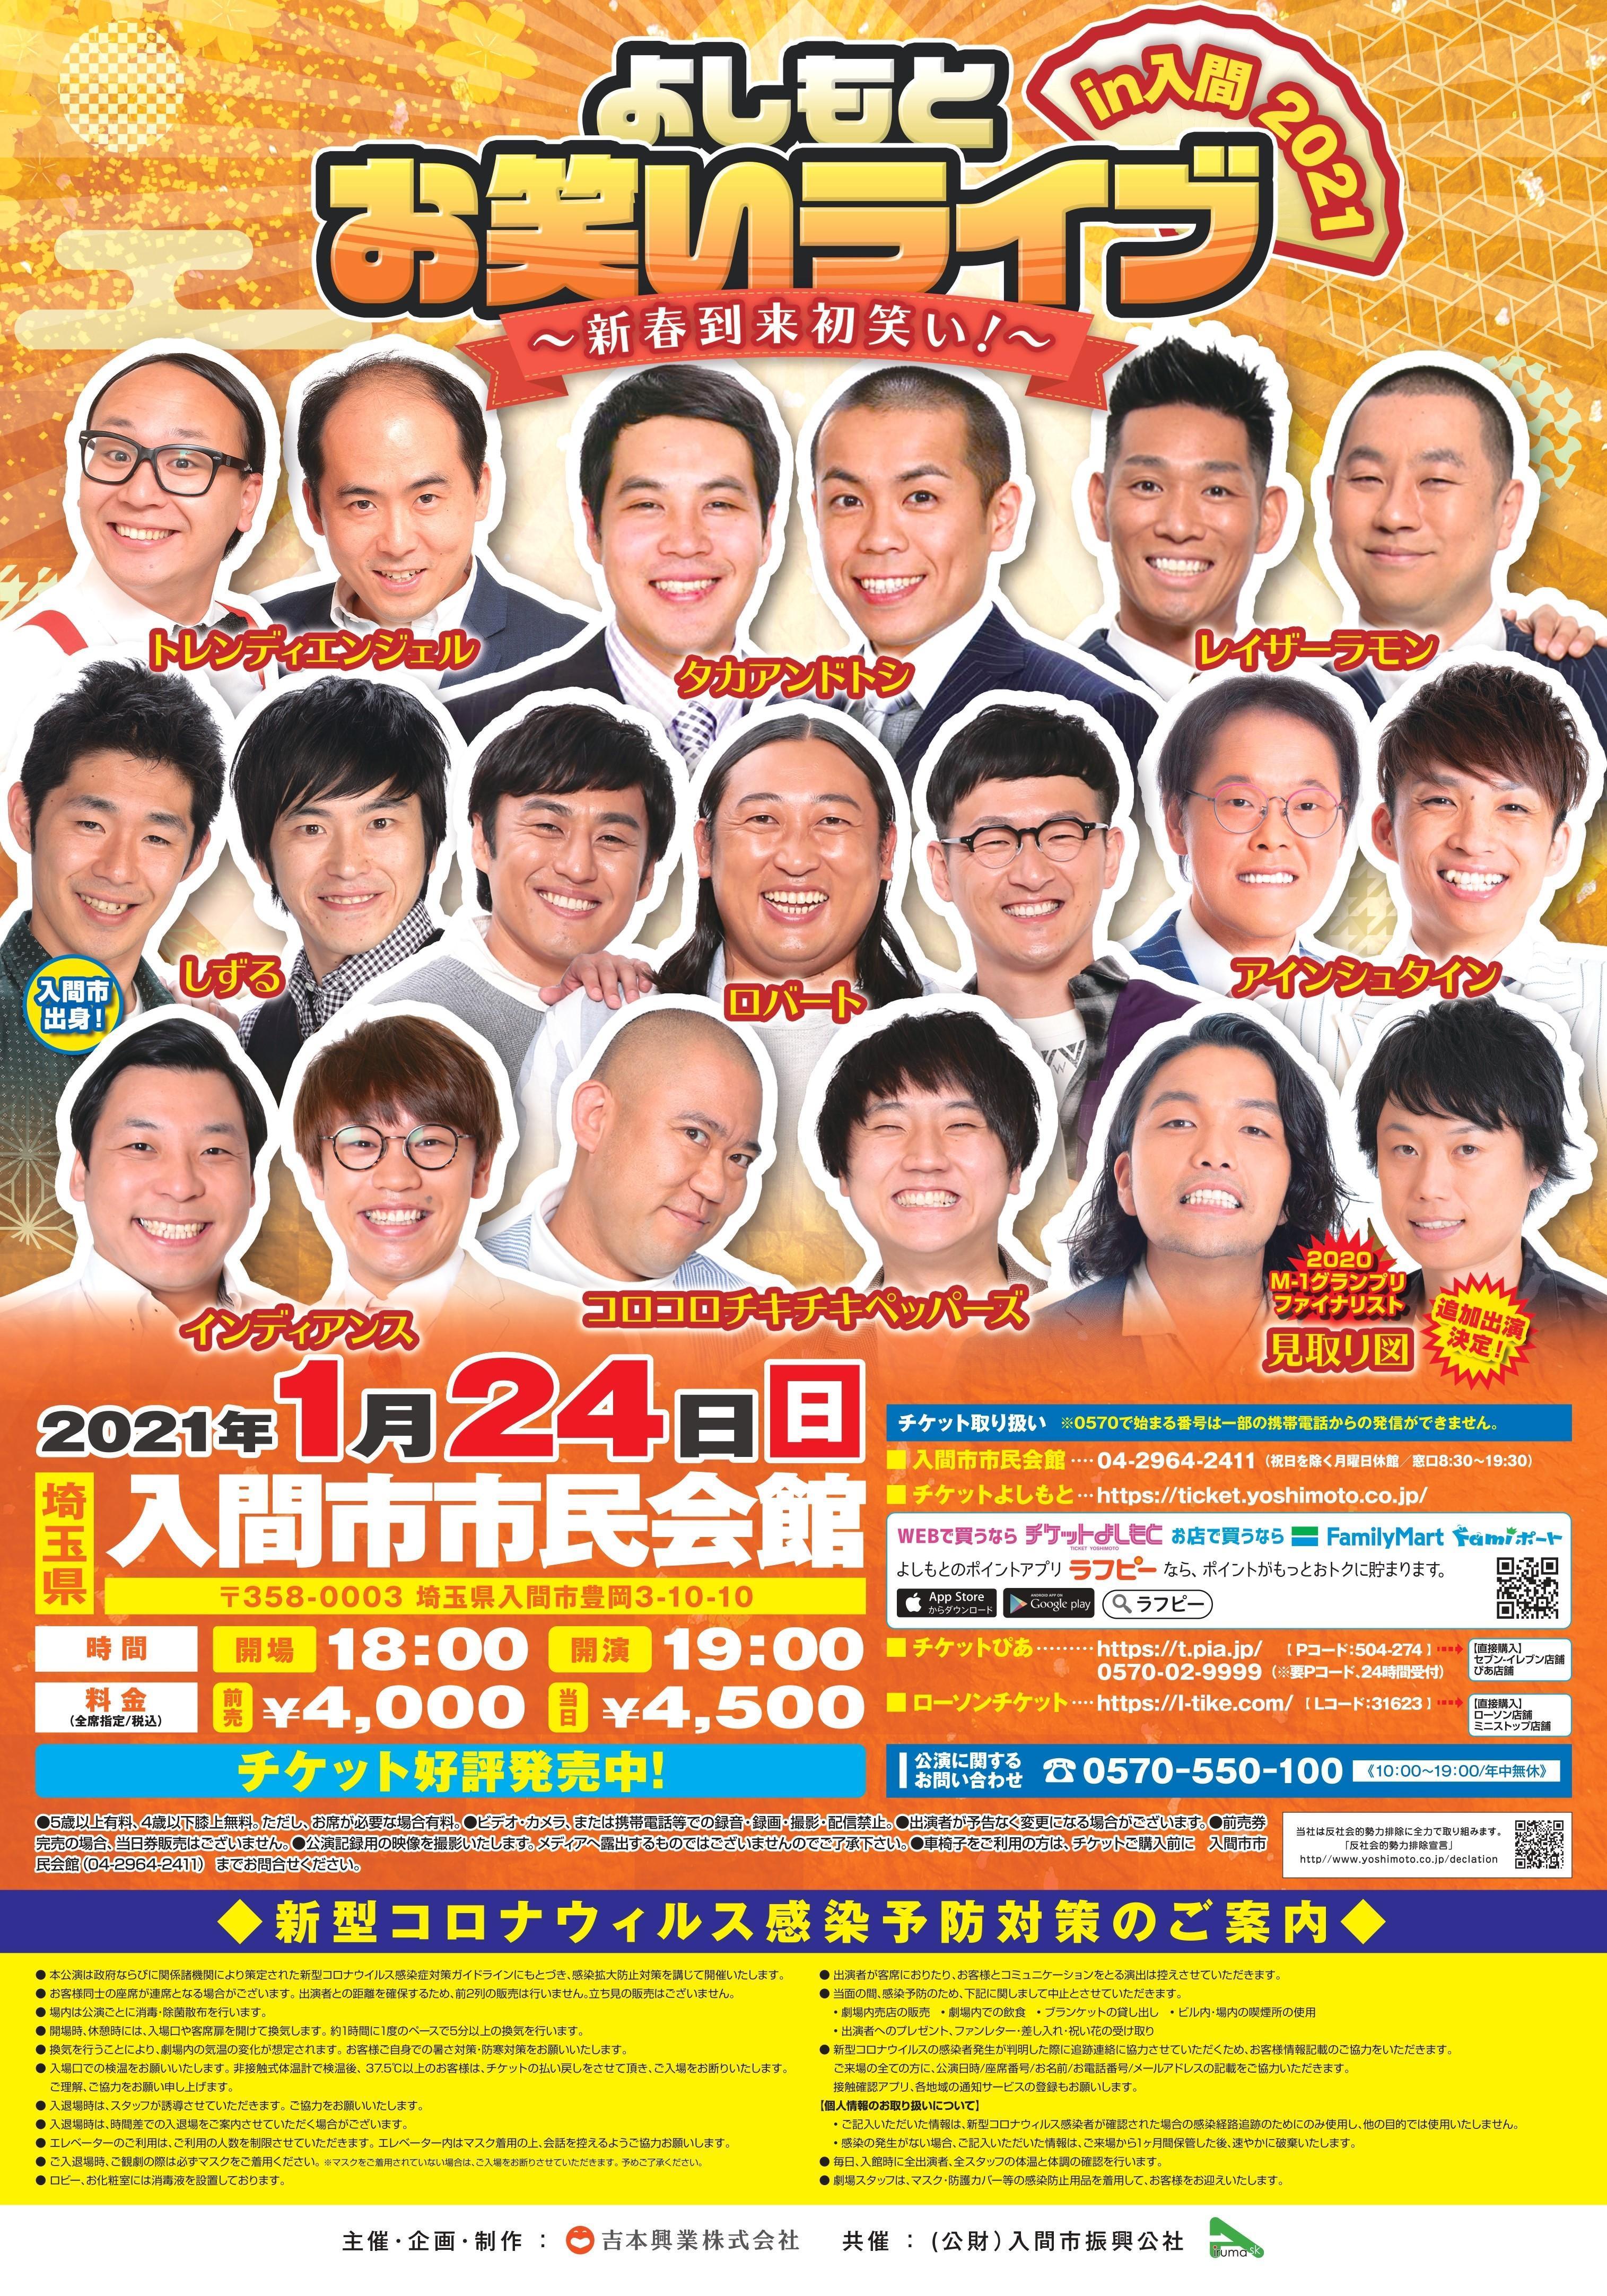 http://www.syumatsu.jp/20201217230735-5f12b0425bda4b3506b90eb1314e177bbe0d40ed.jpg